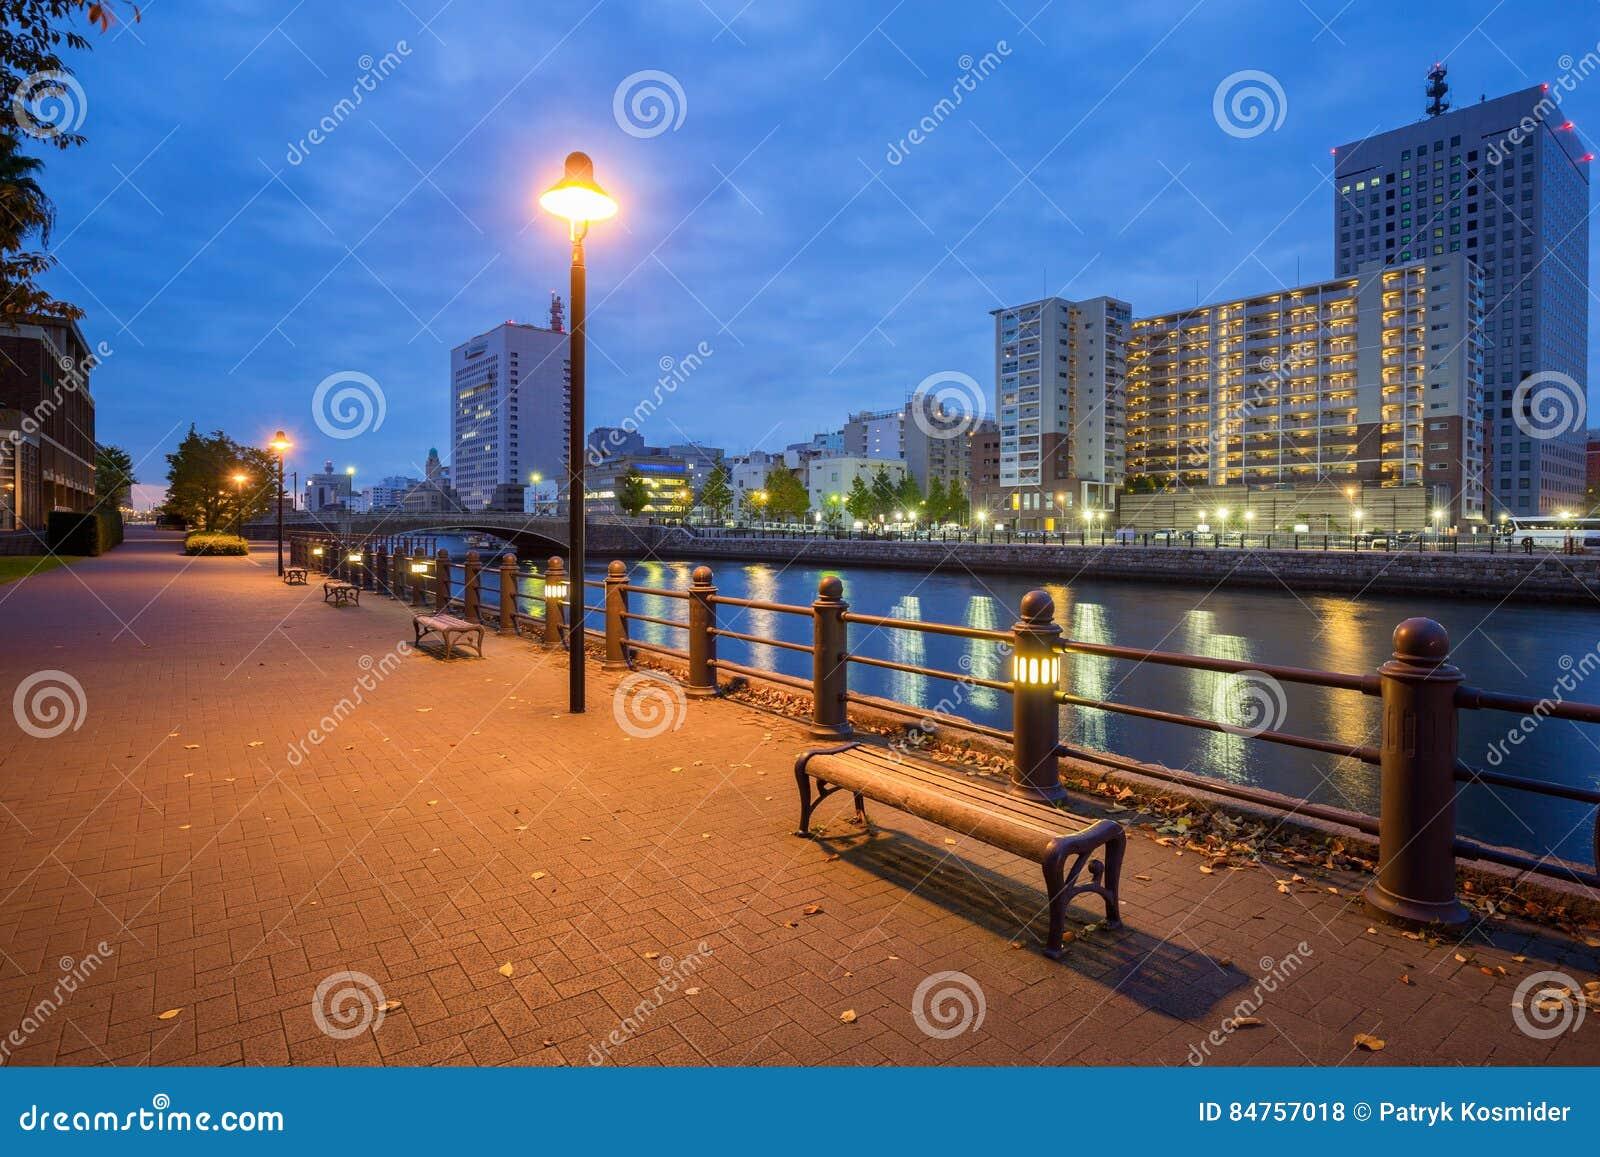 Stadtbild von Yokohama-Stadt nachts